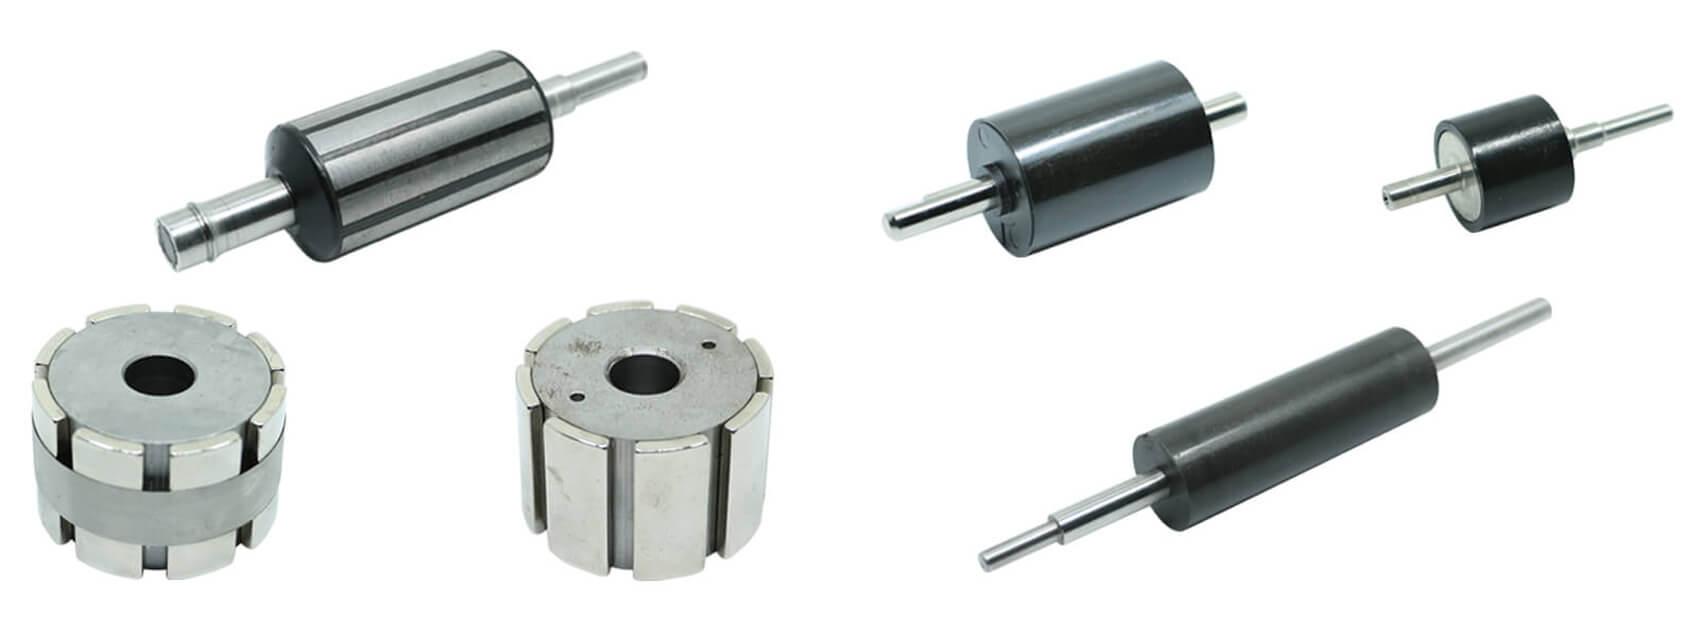 Magnetic Rotor Assemblies